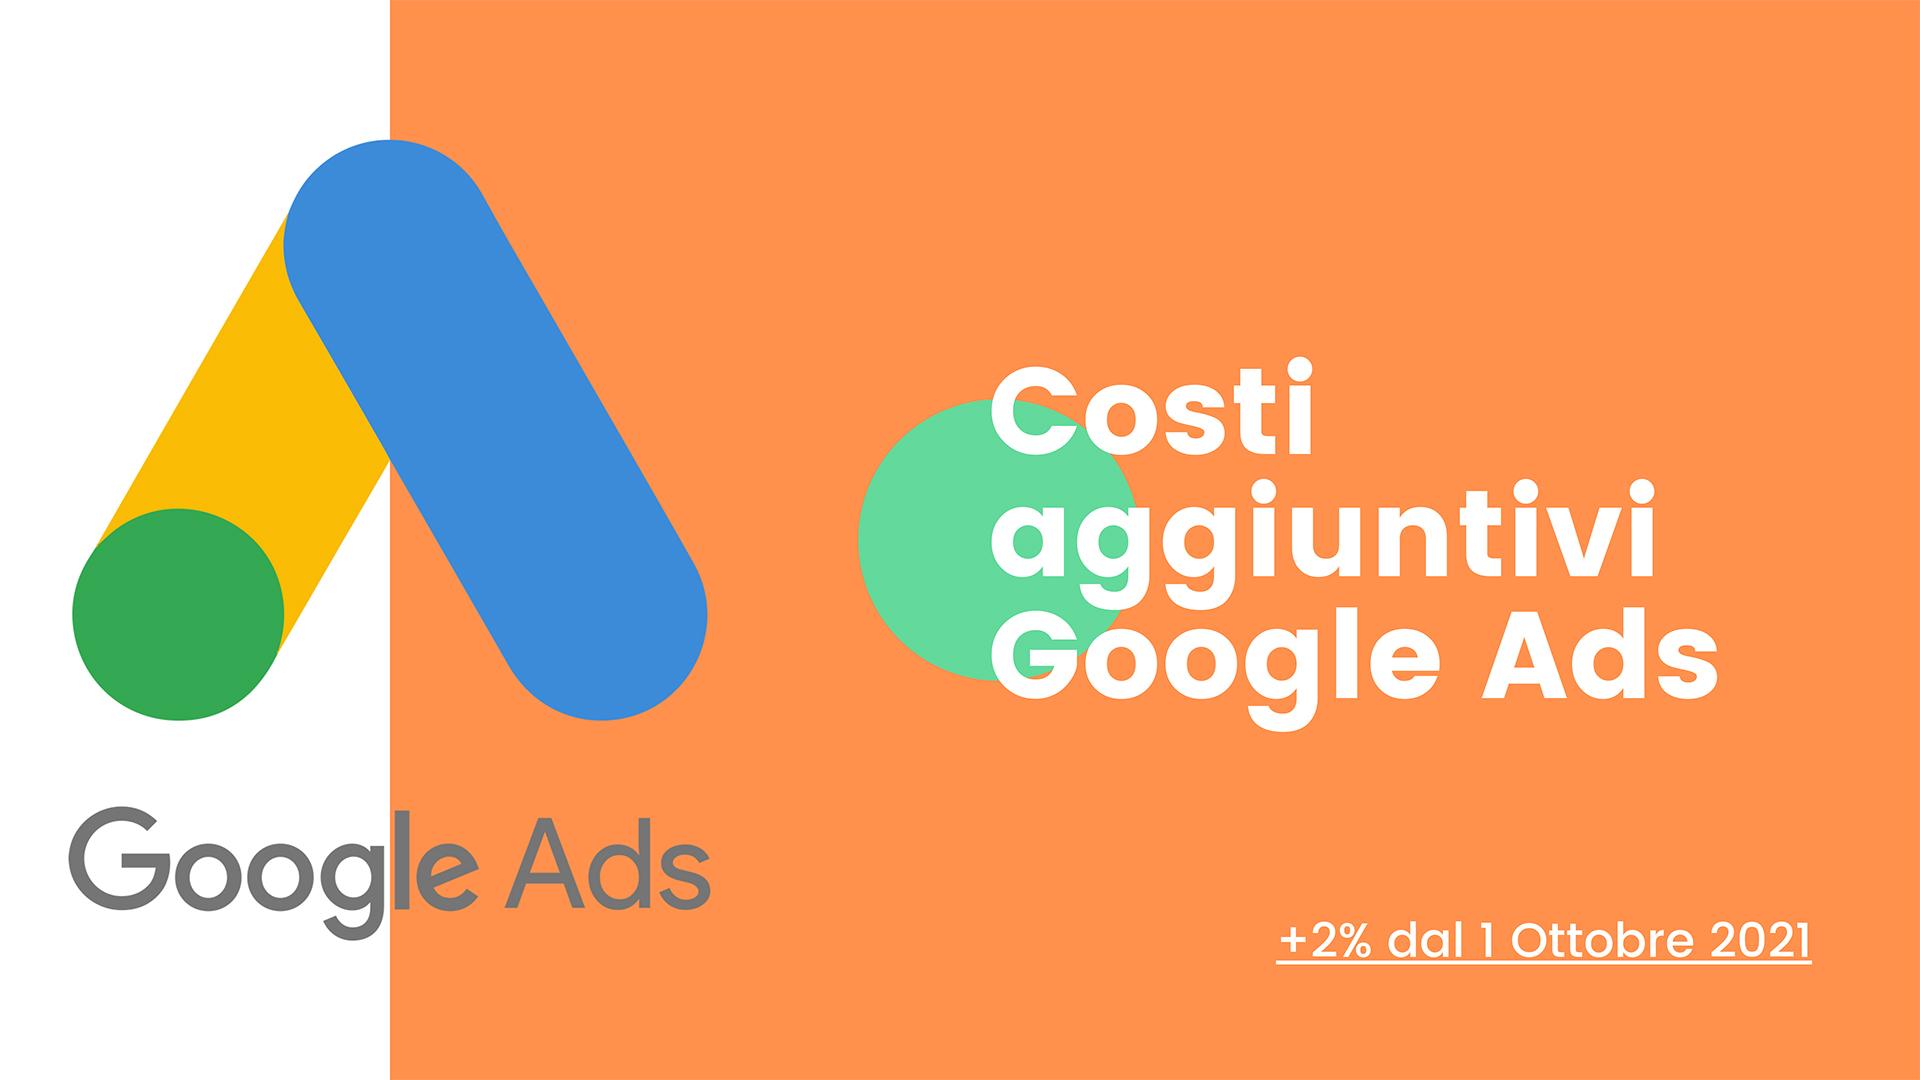 Costi aggiuntivi google ads